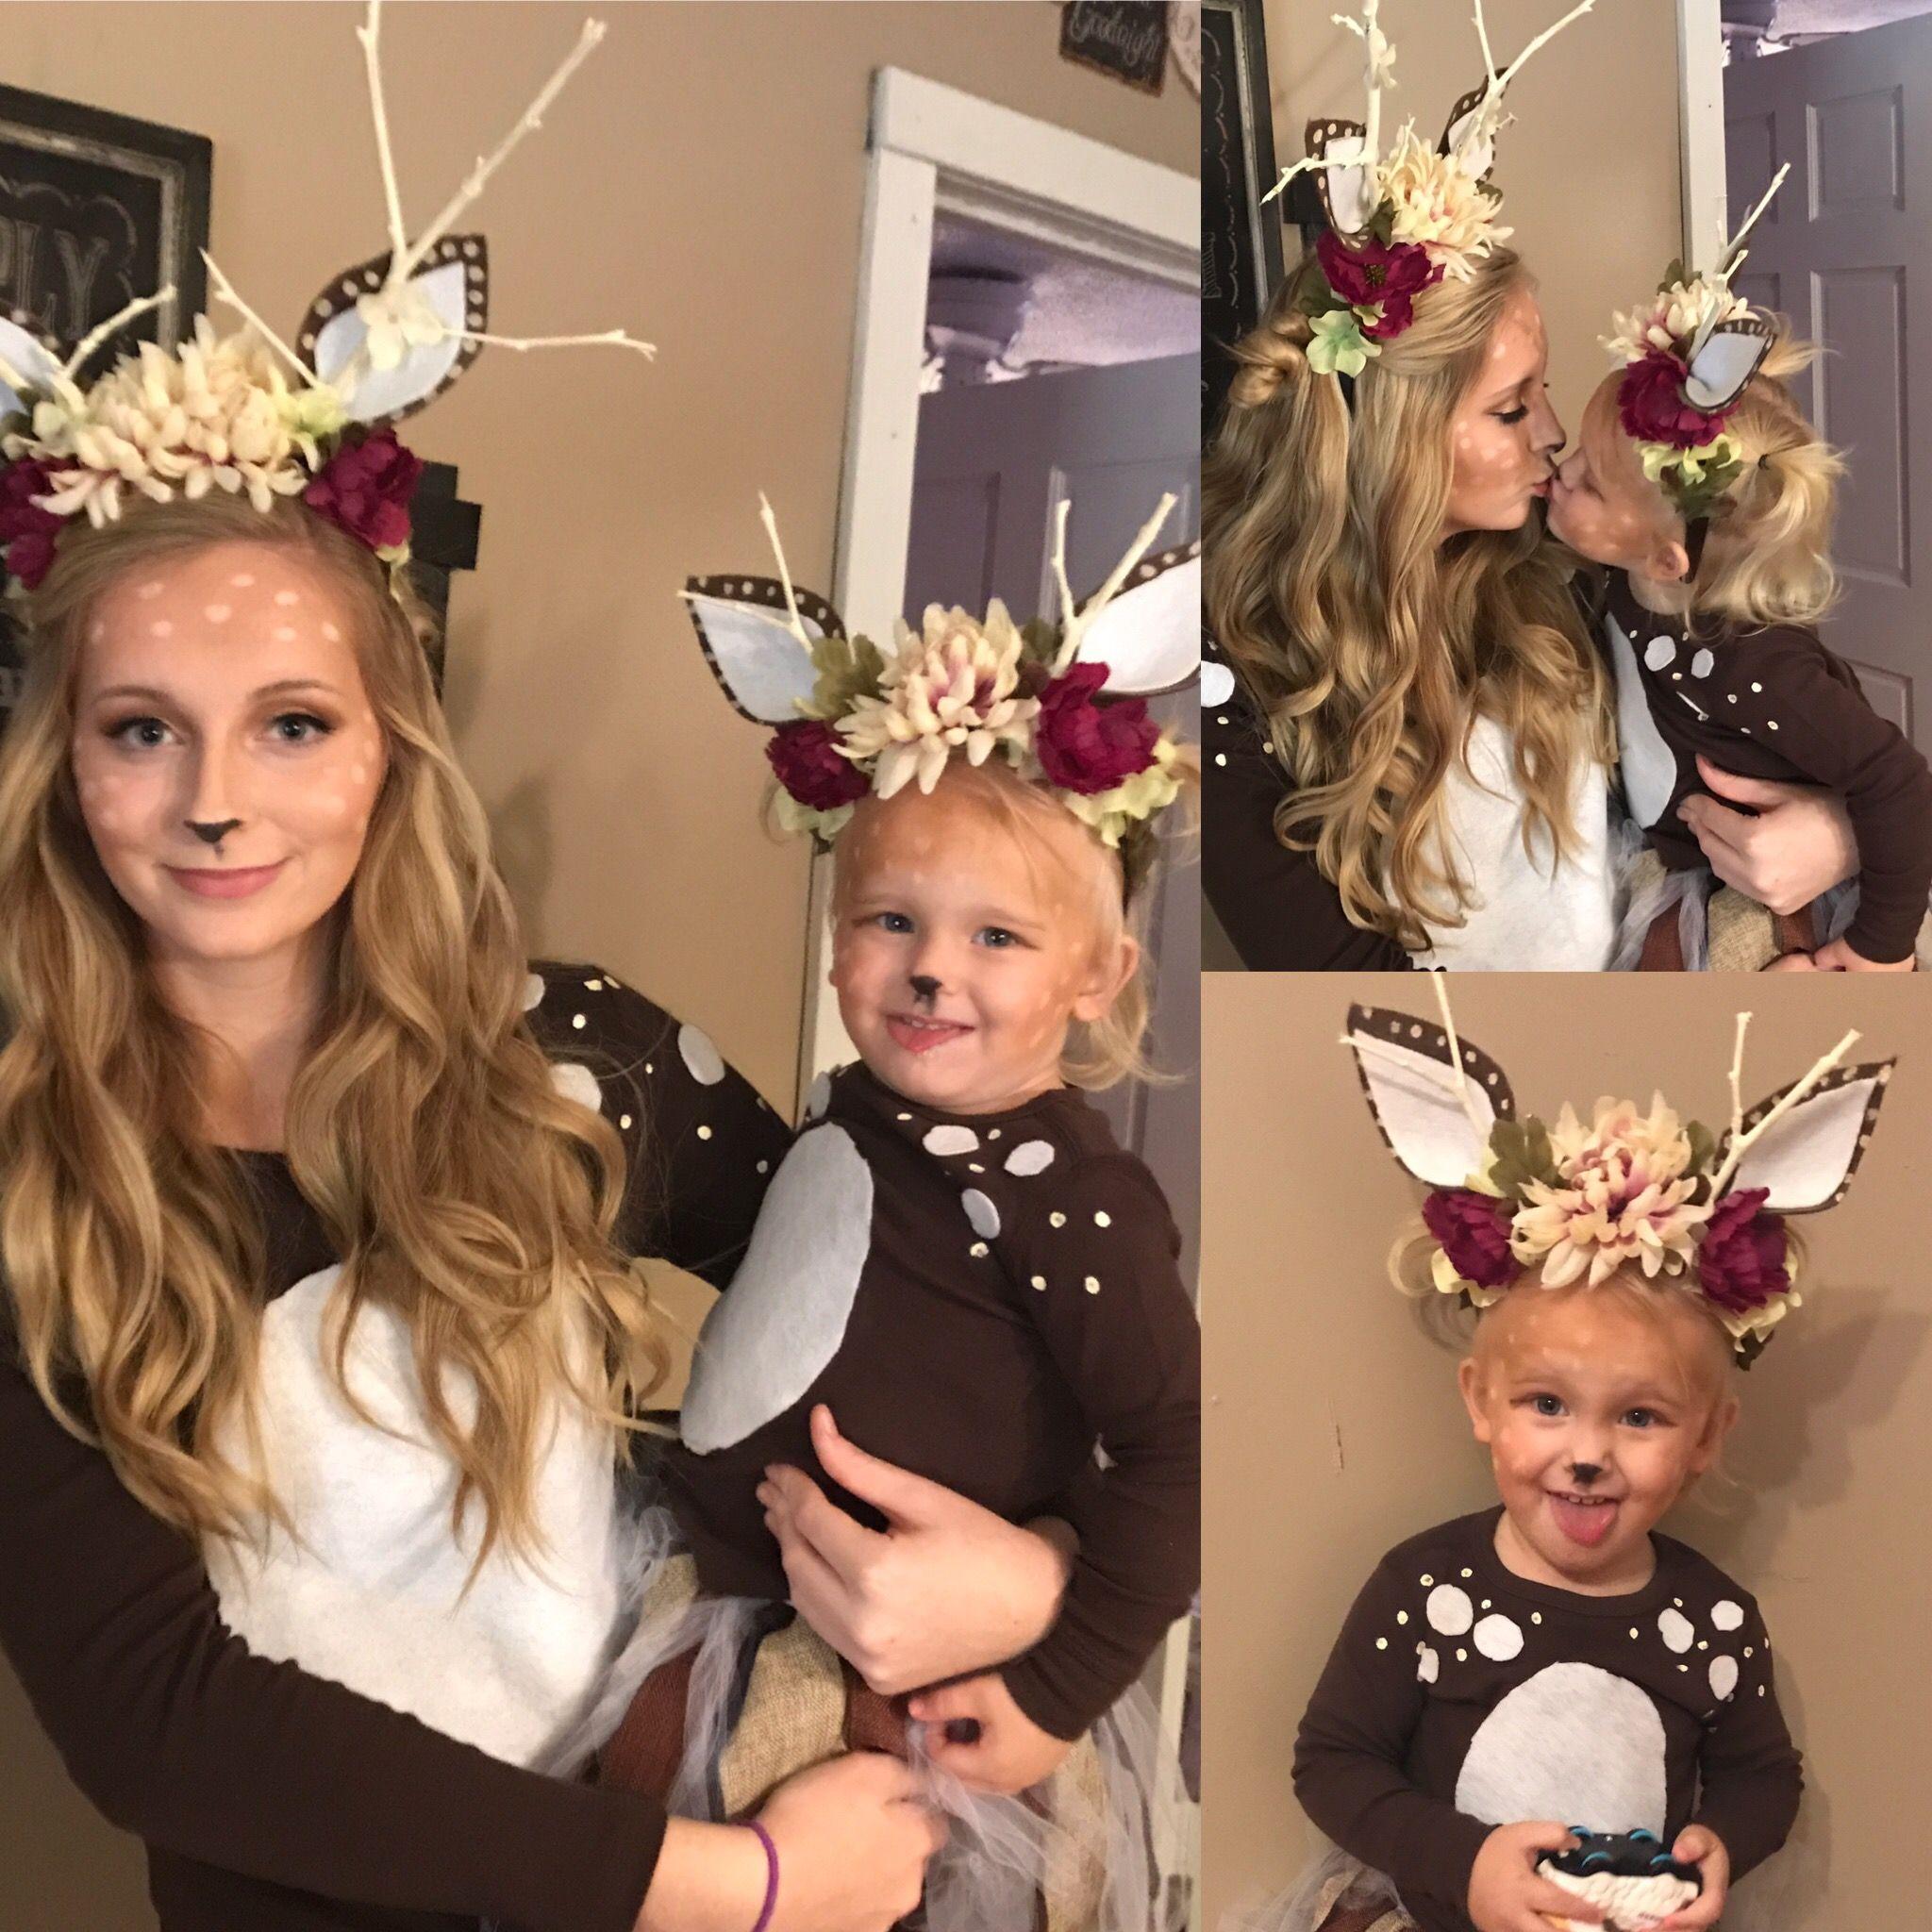 diy deer costume ~ mommy & me ~ toddler deer costume idea #toddlerhalloween